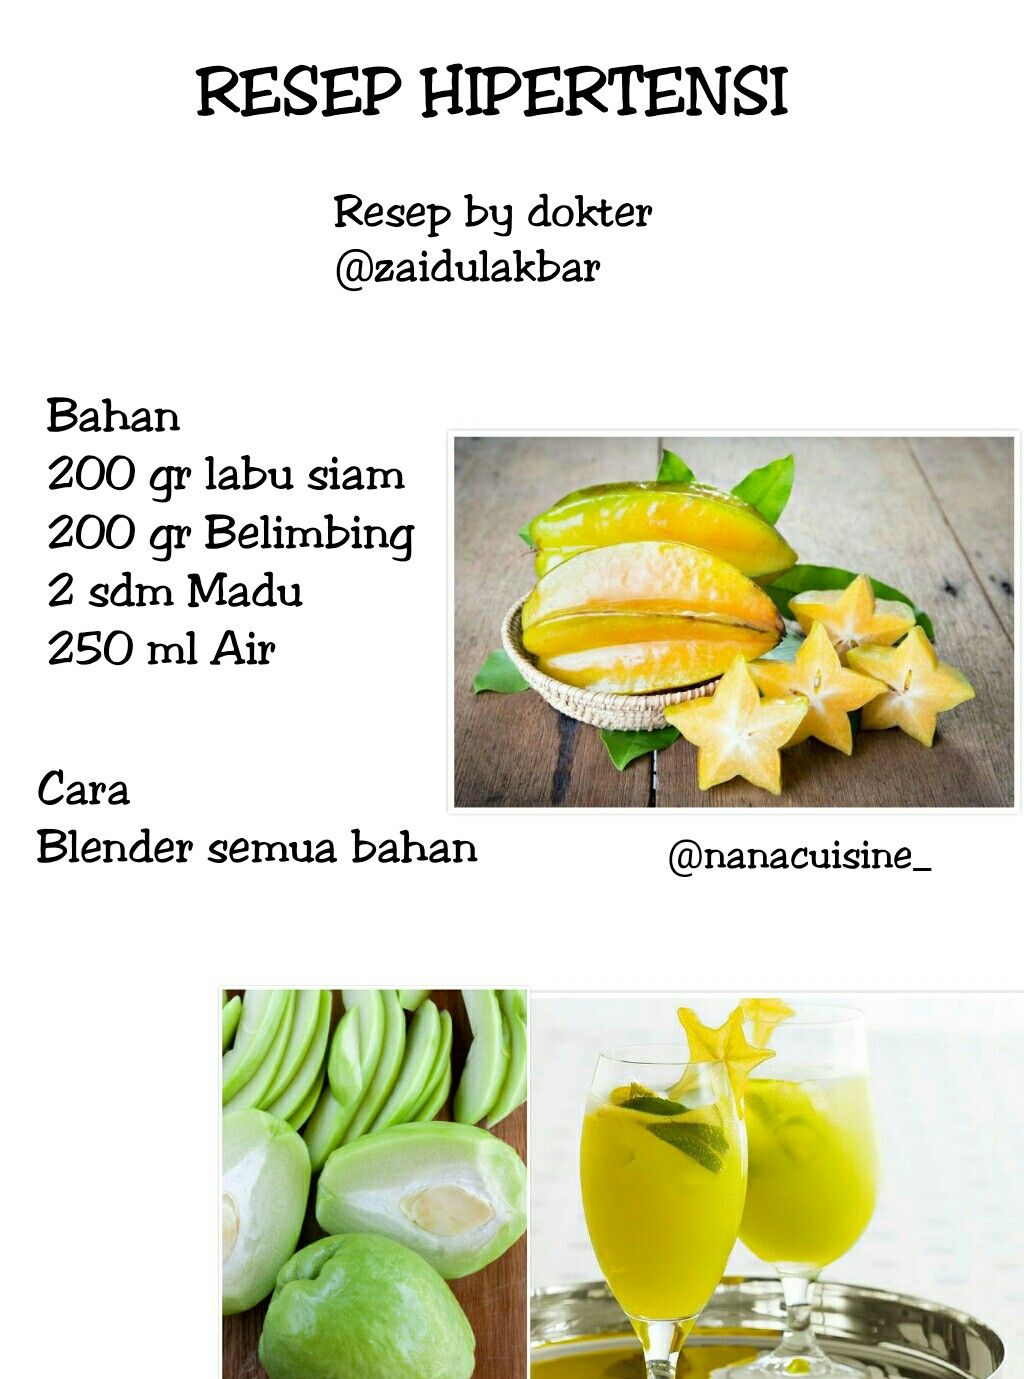 Jsr Zaiful Akbar Resep Diet Sehat Diet Detoks Resep Makanan Sehat